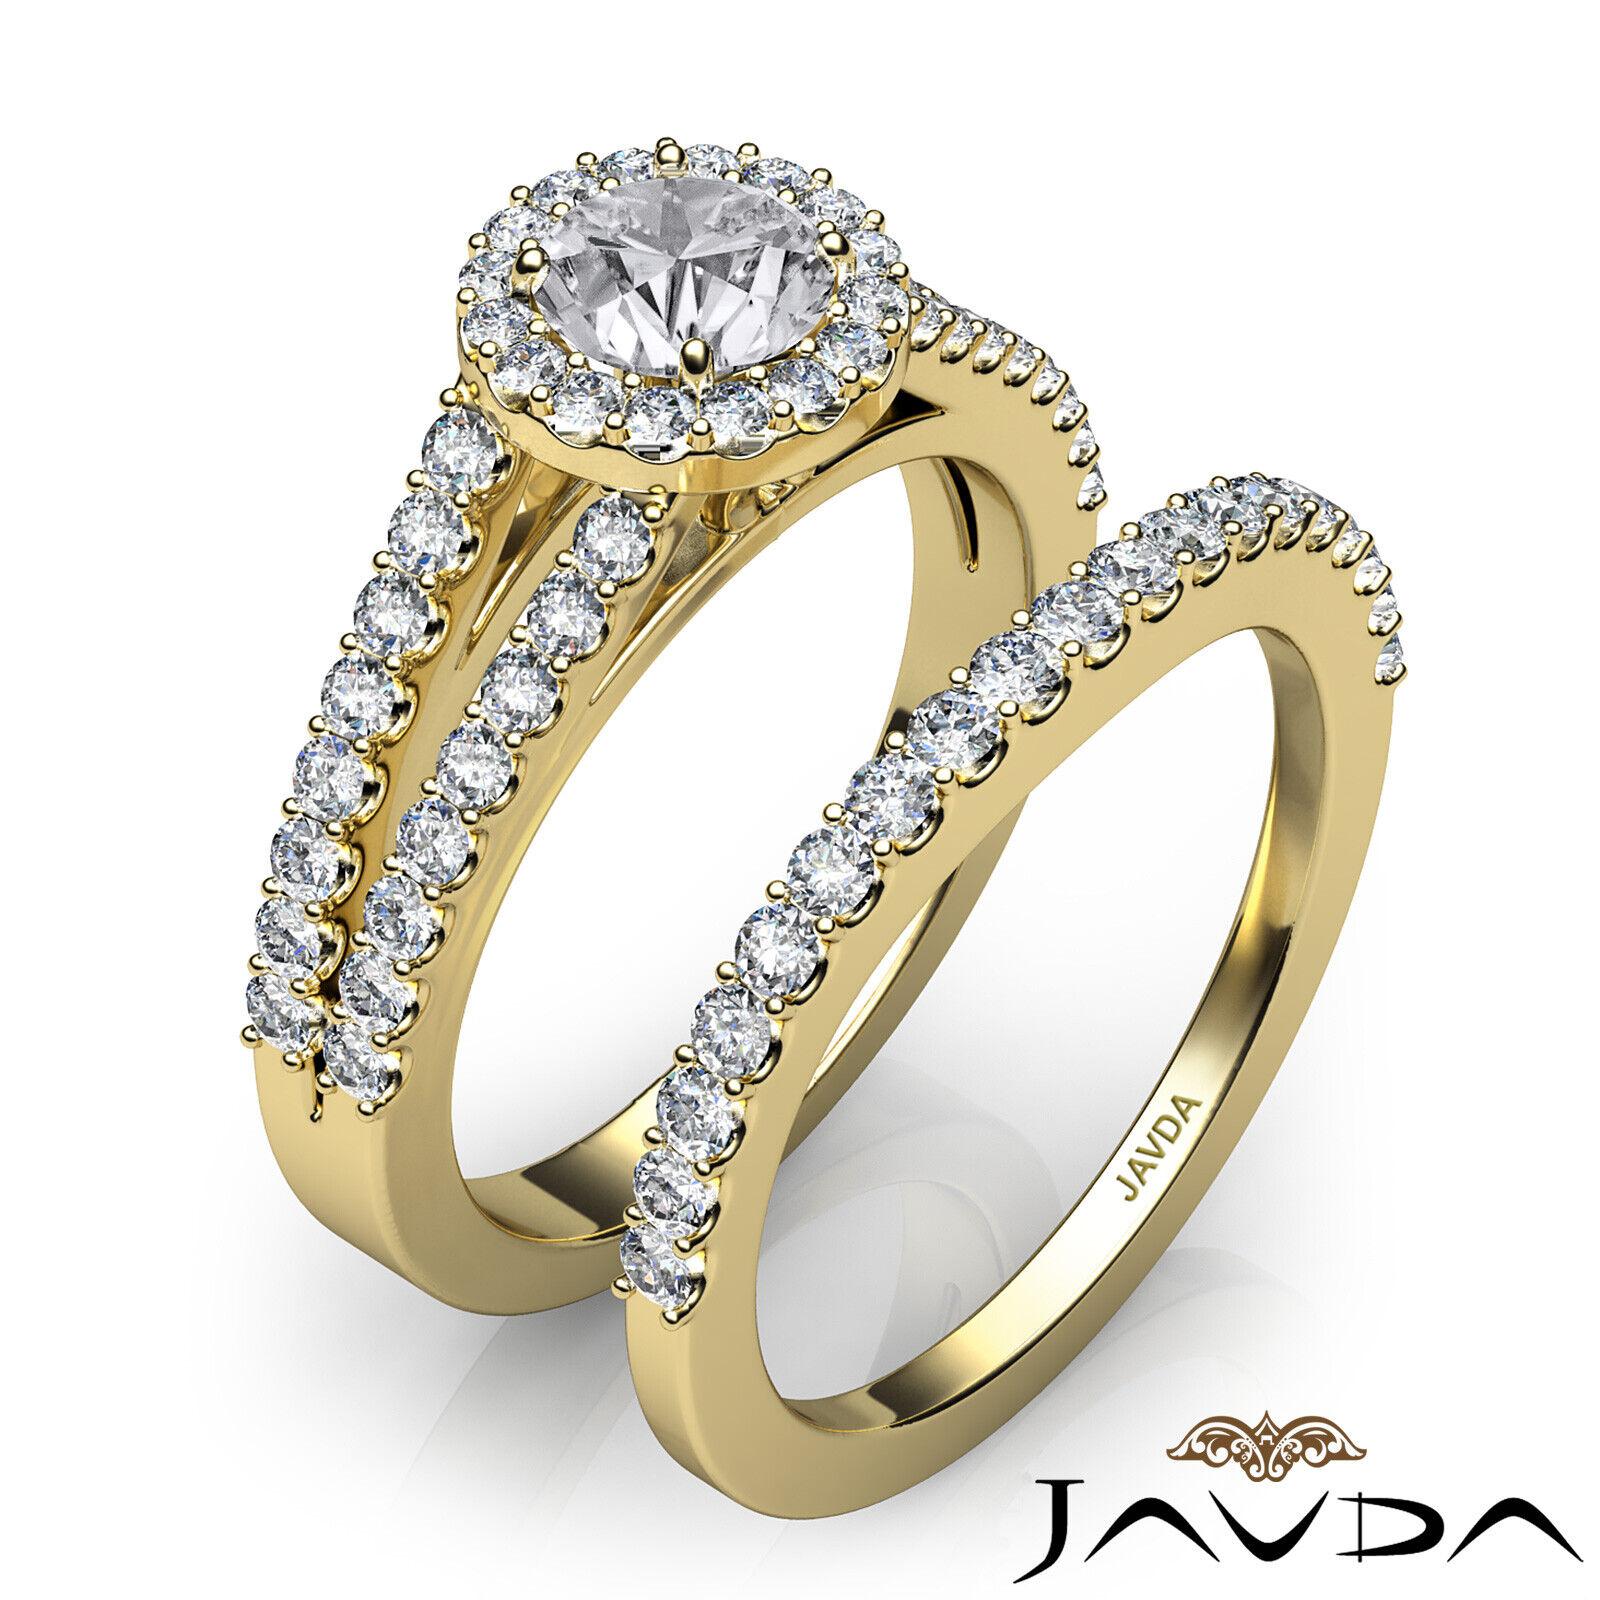 1.85ctw Luxurious Wedding Bridal Round Diamond Engagement Ring GIA G-VVS1 W Gold 10